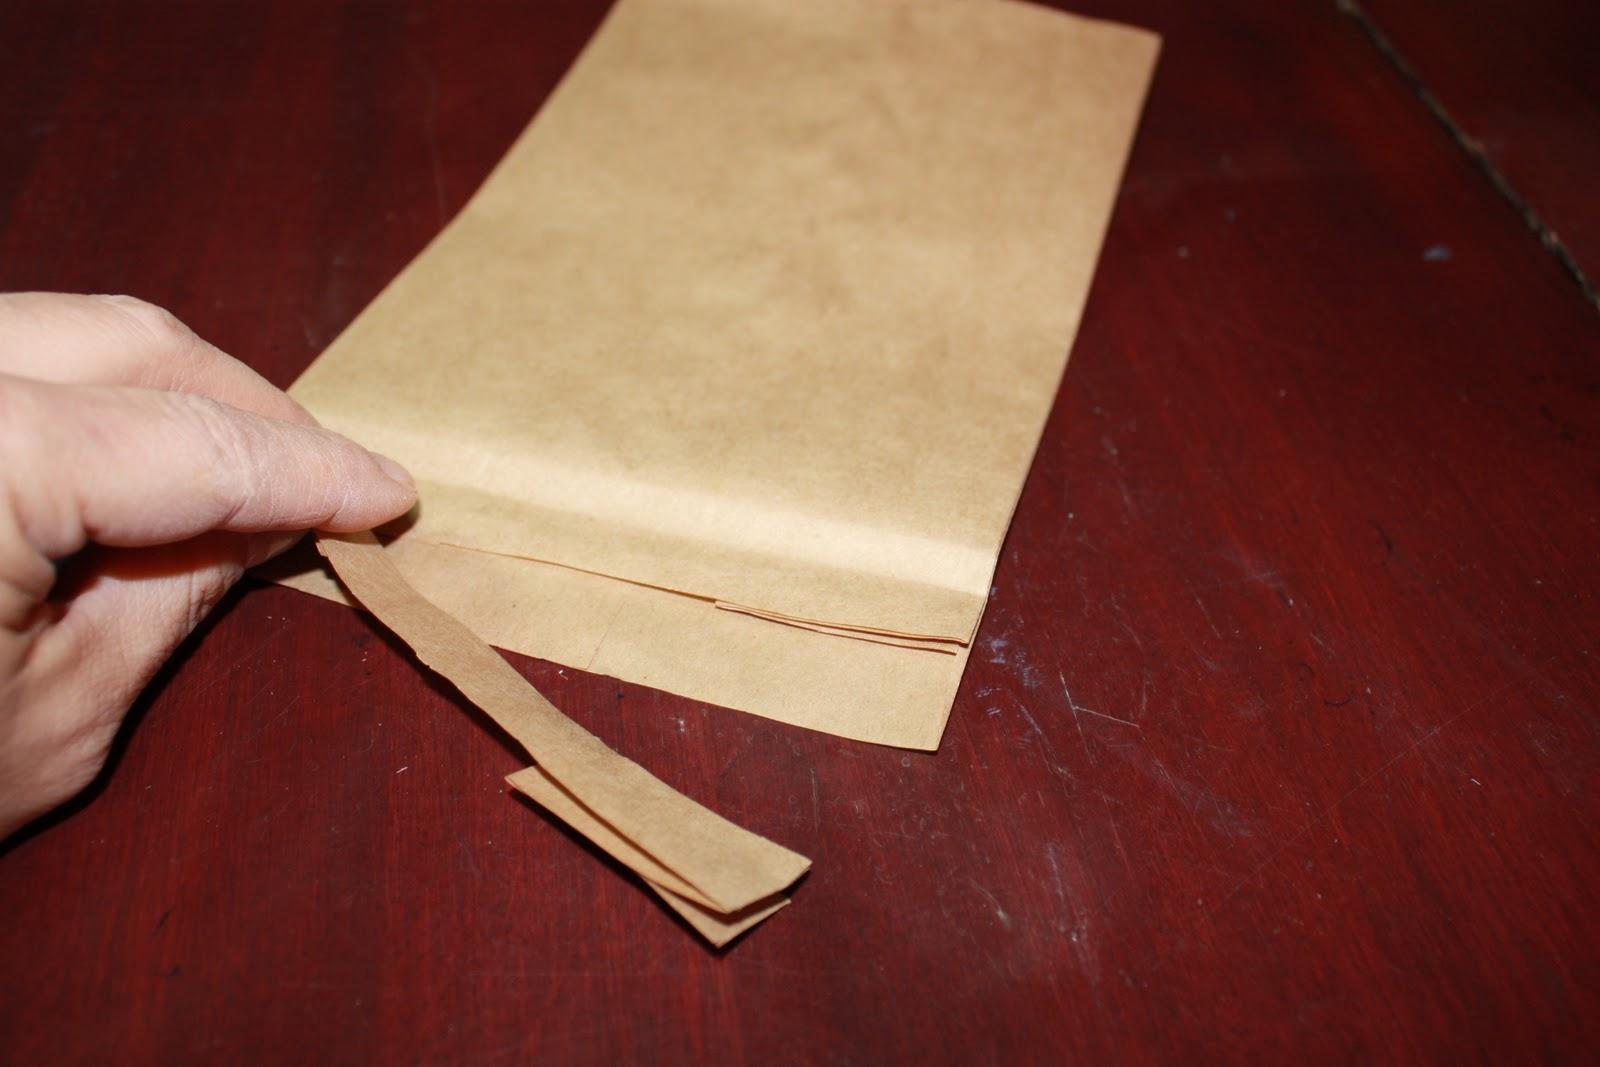 tampes jolie cr er une enveloppe avec un sac a lunch create an enveloppe whit a lunch bag. Black Bedroom Furniture Sets. Home Design Ideas